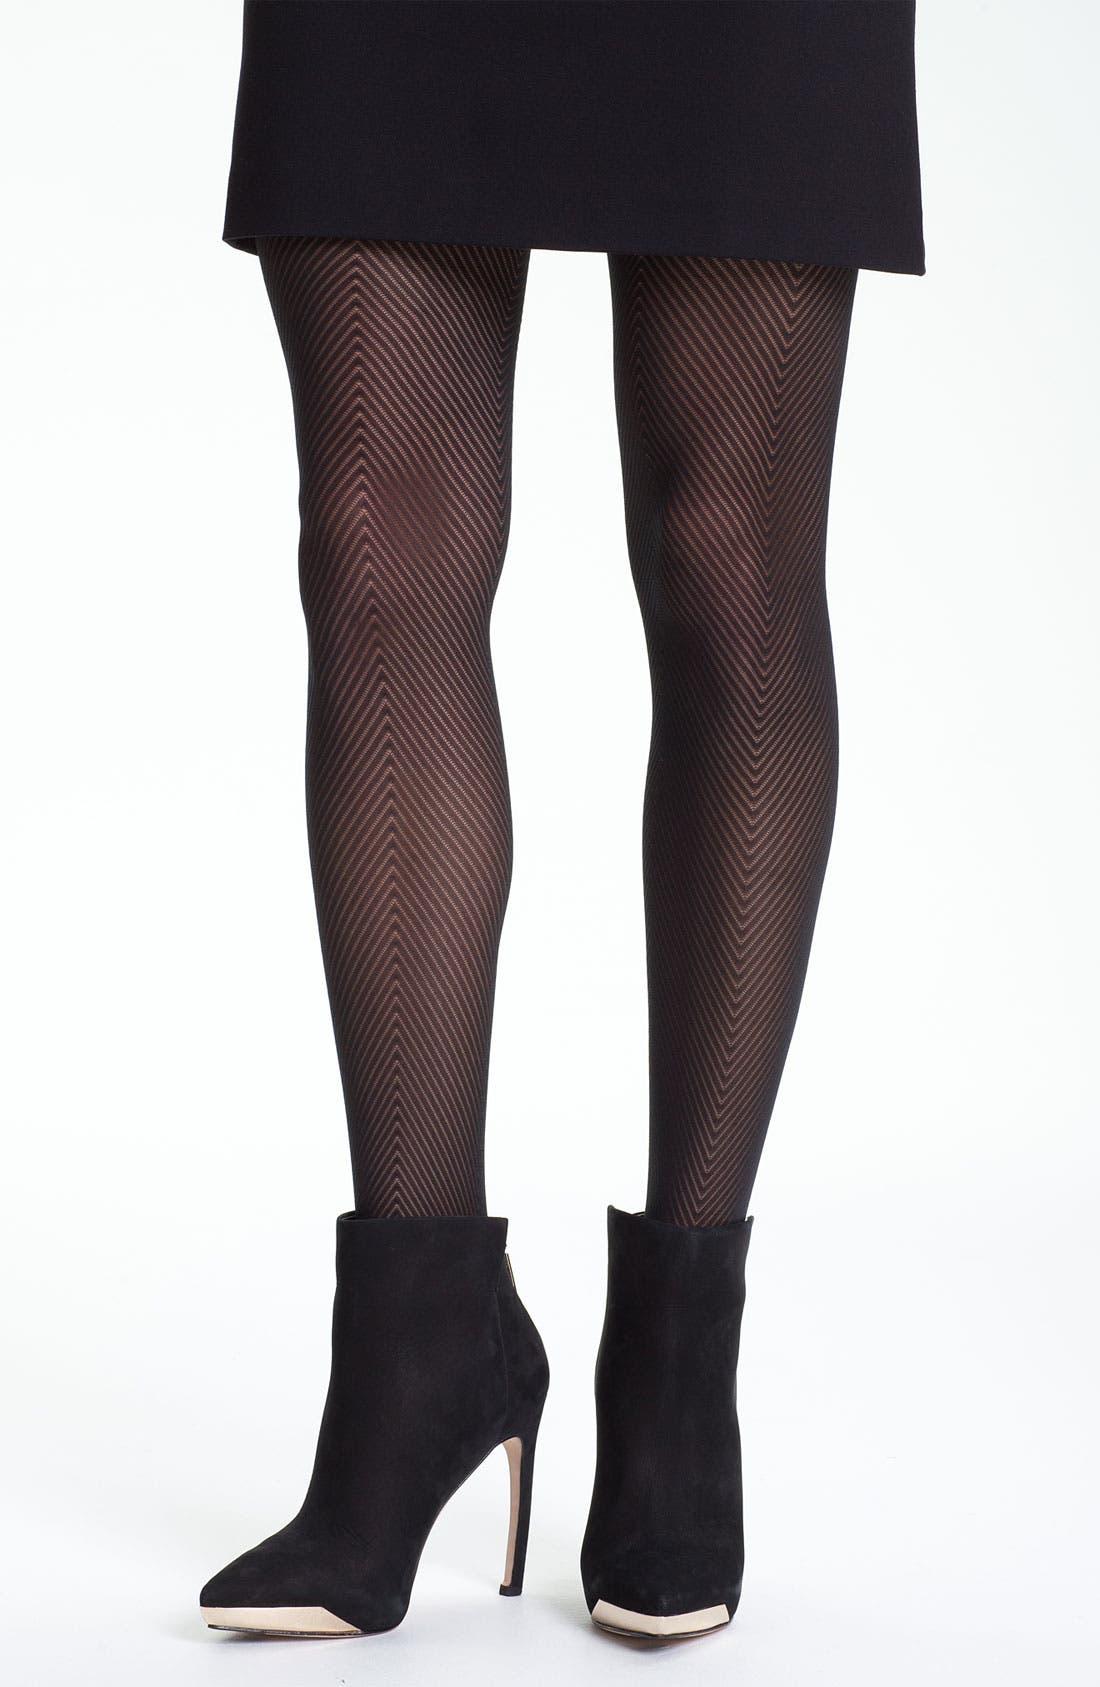 Alternate Image 1 Selected - Calvin Klein 'Overscale Herringbone' Tights